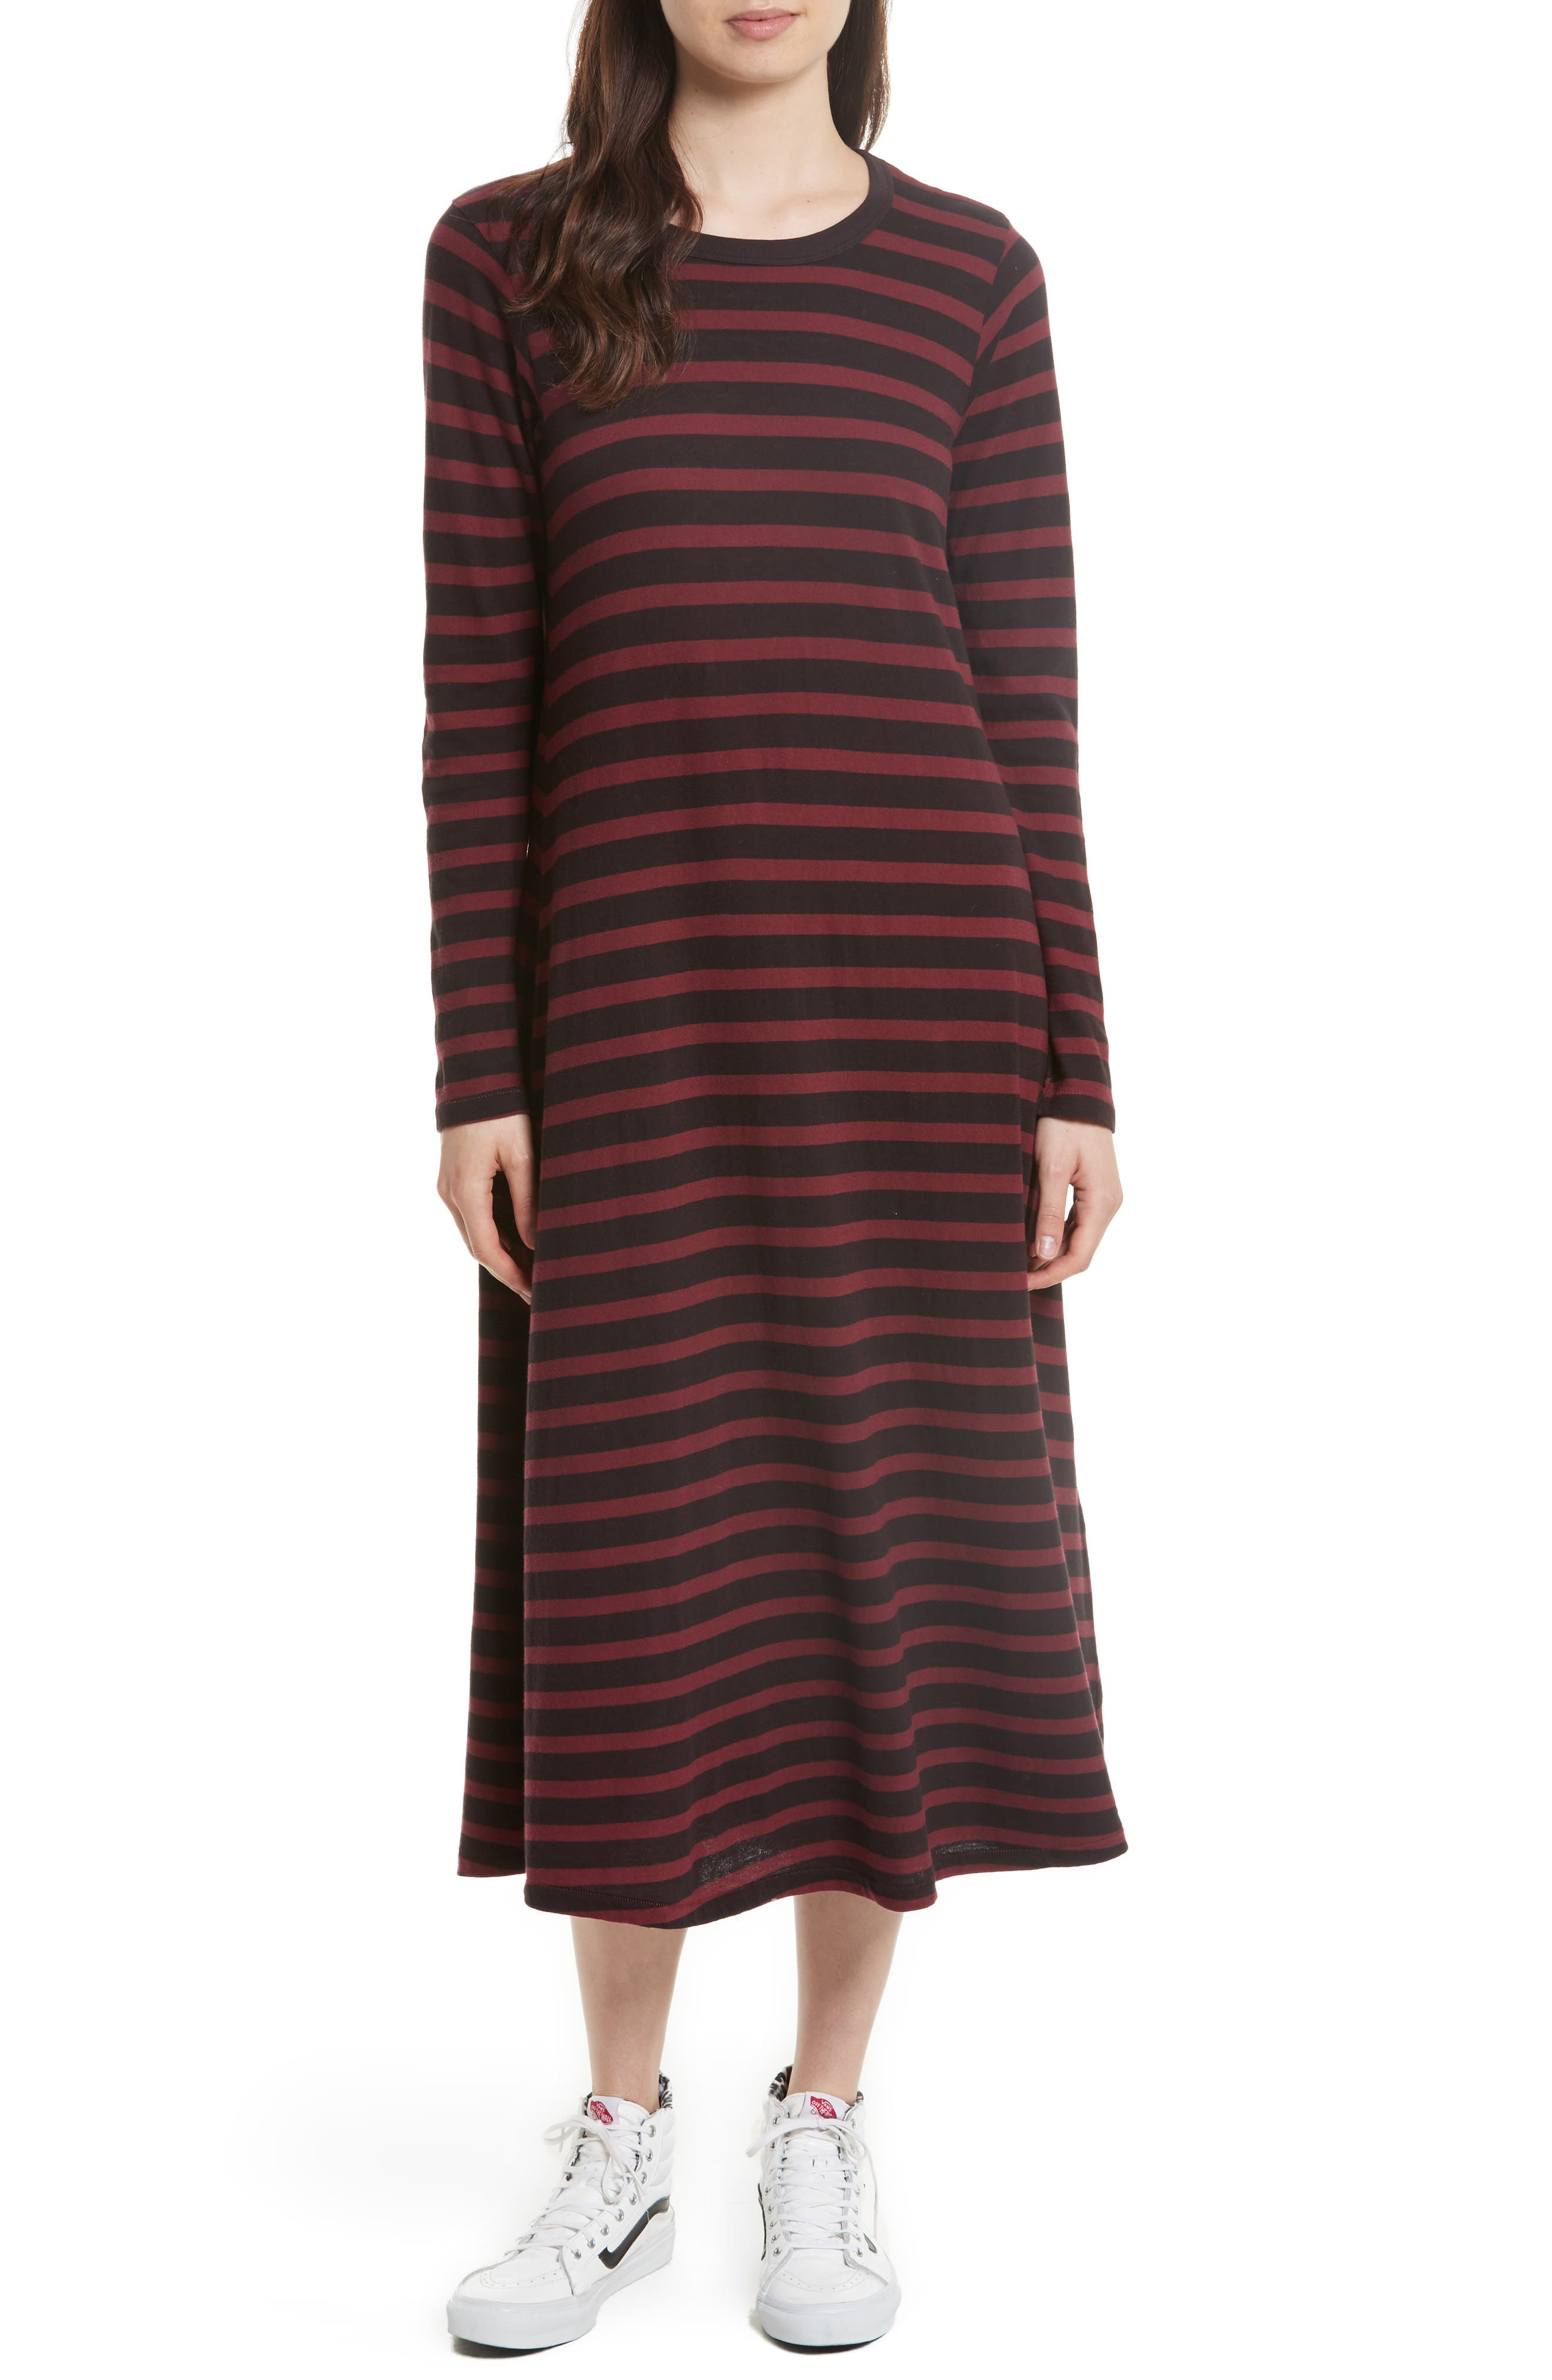 THE GREAT. The Swing Stripe Midi Dress